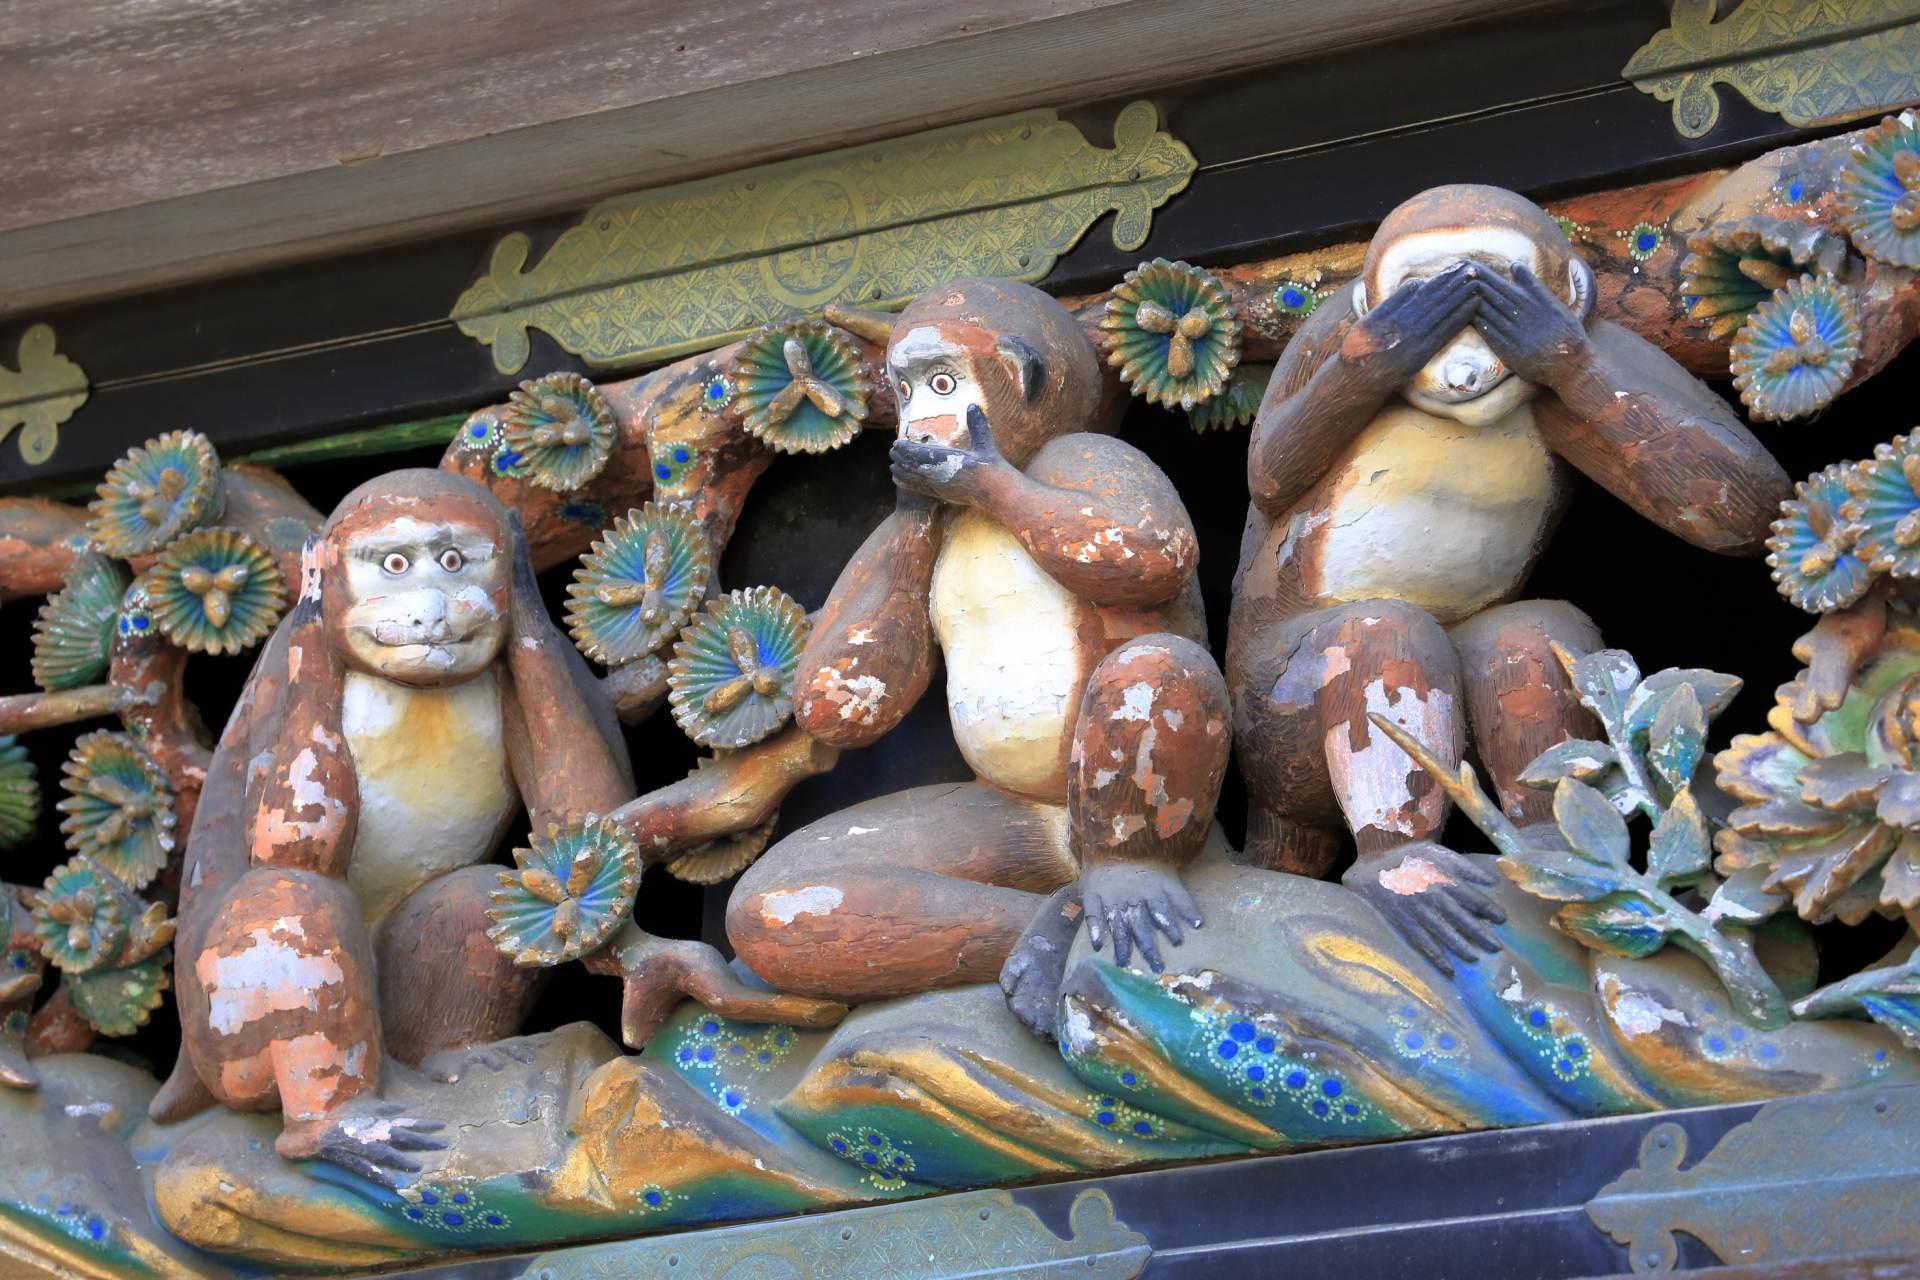 Nikko Toshogu Shrine, The three monkeys: See no evil, Speak no evil, Hear no evil